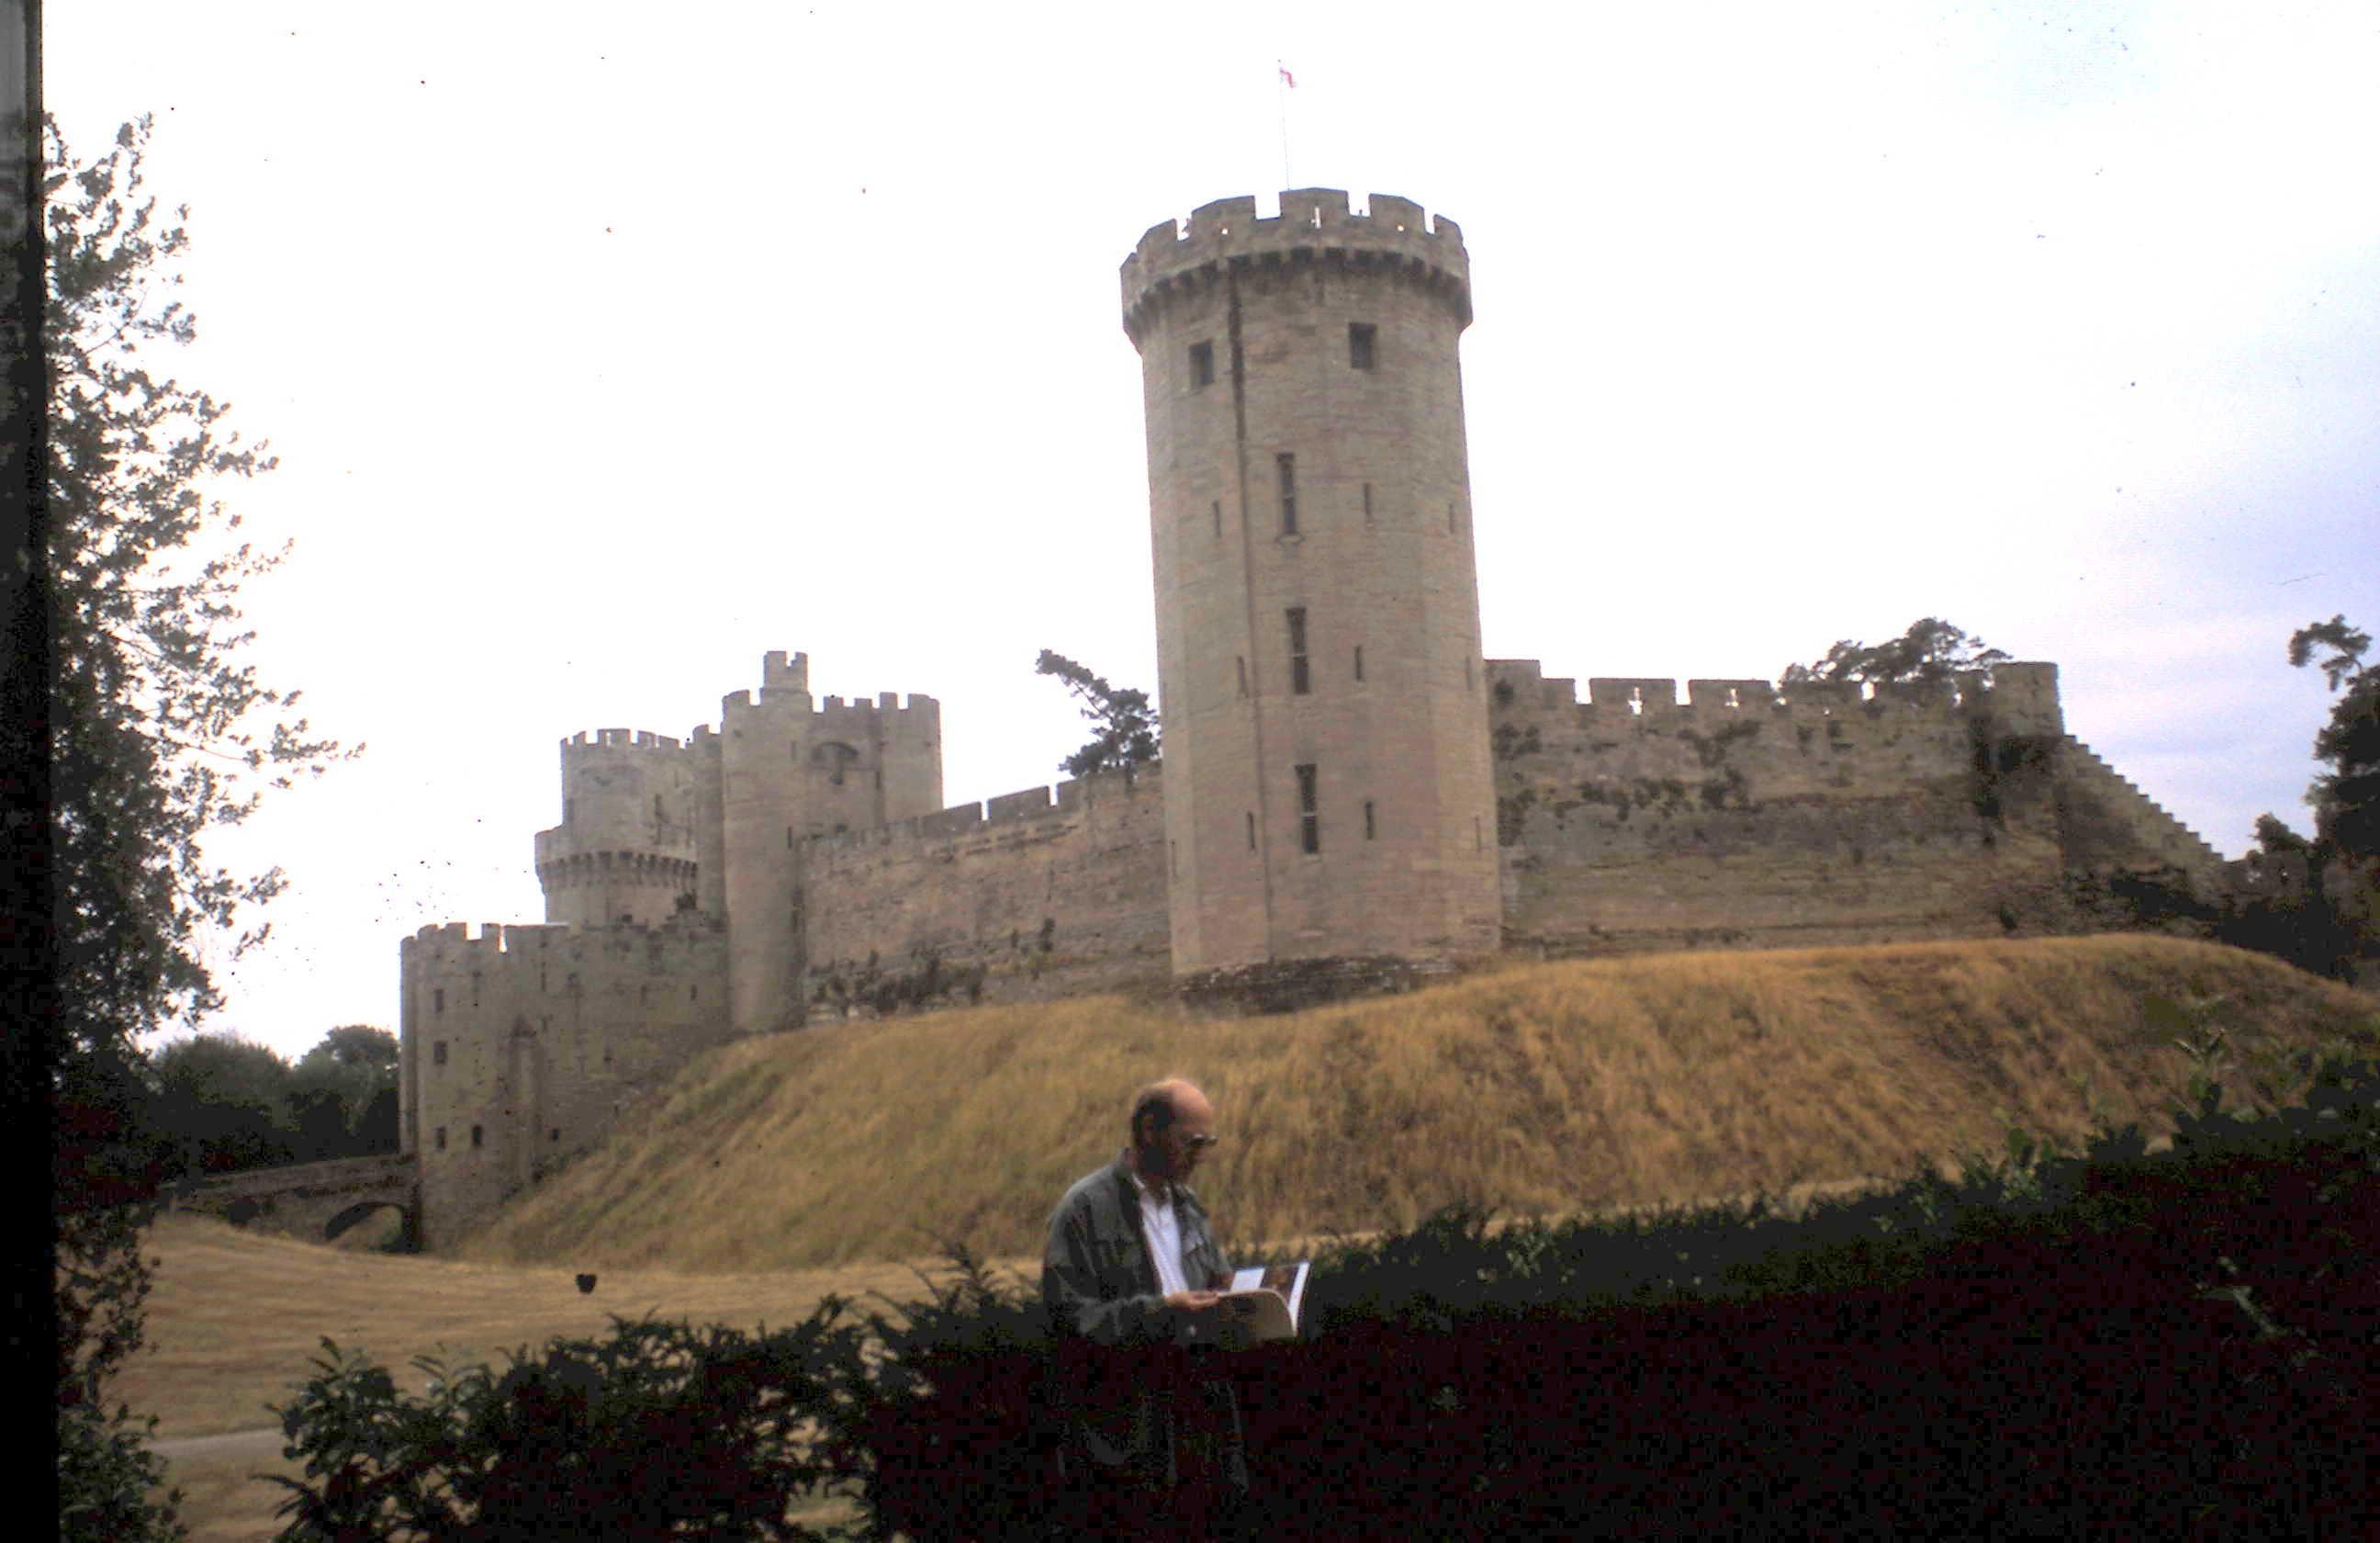 1911 1995-08-11 Warwick